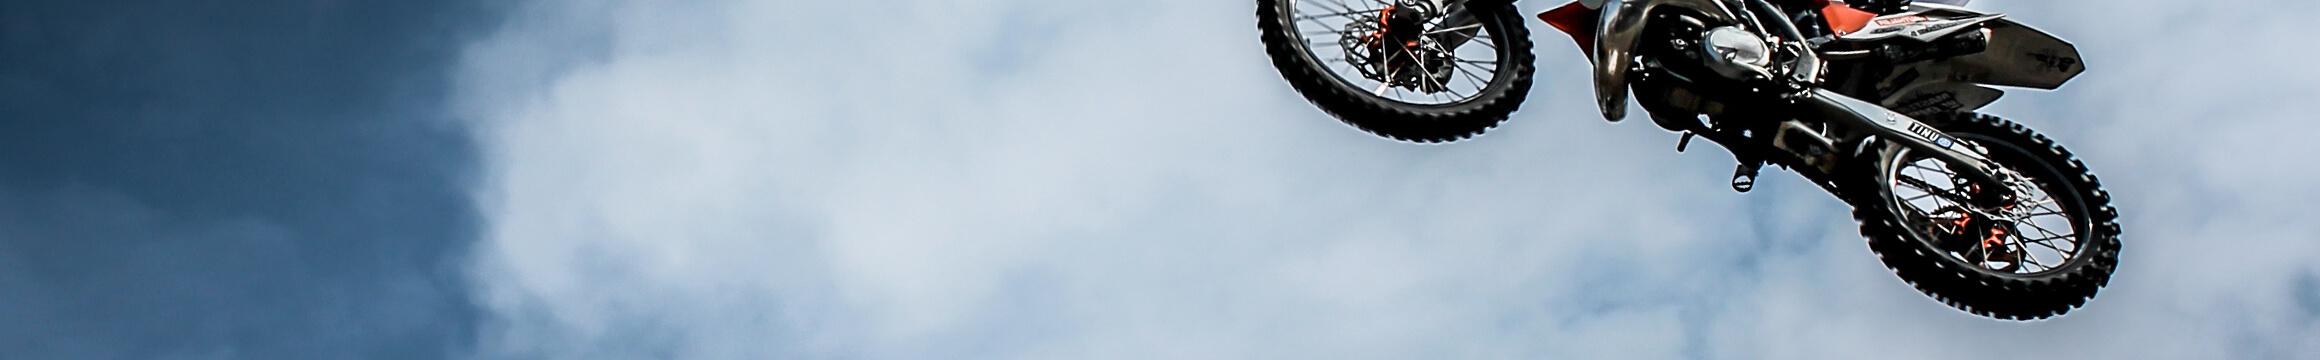 Sport Bikes 02